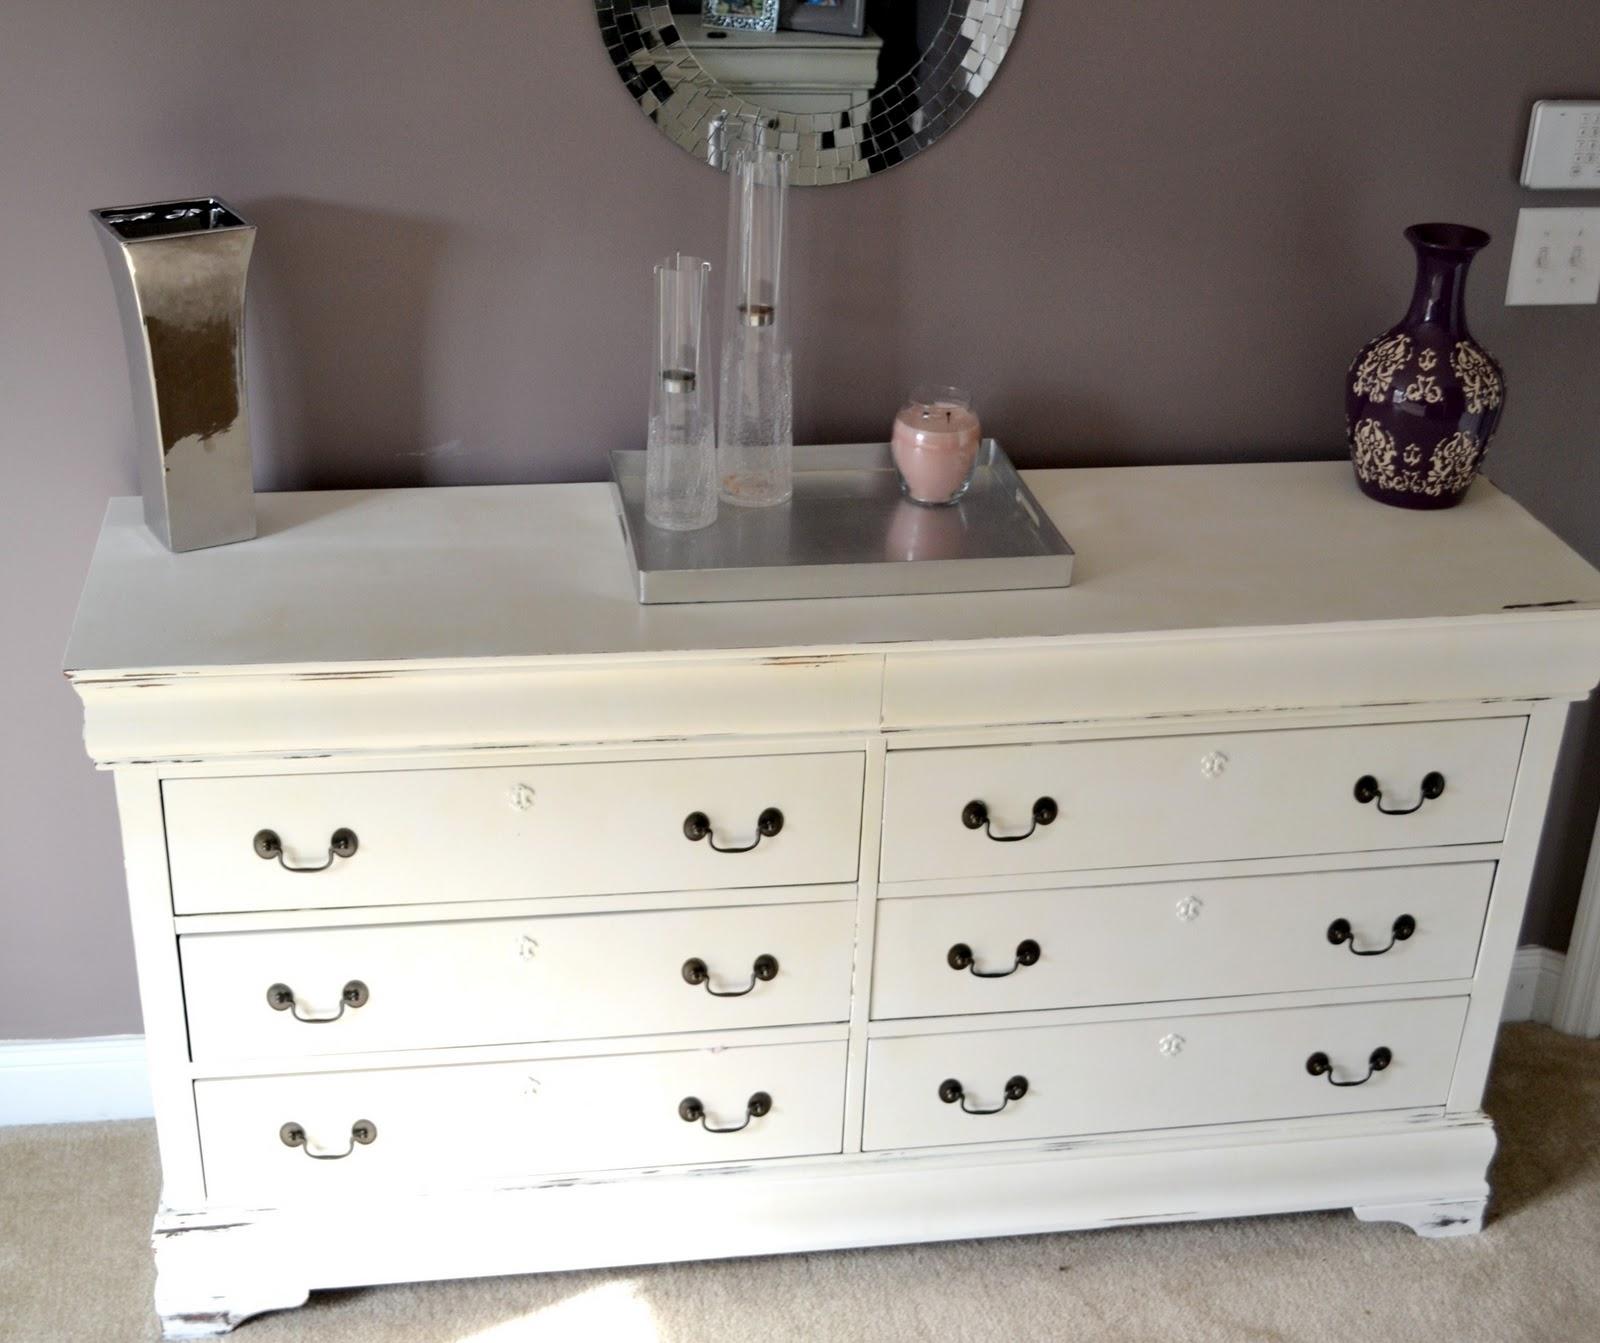 whitewashed bedroom furniture. white washed whitewashed bedroom furniture f